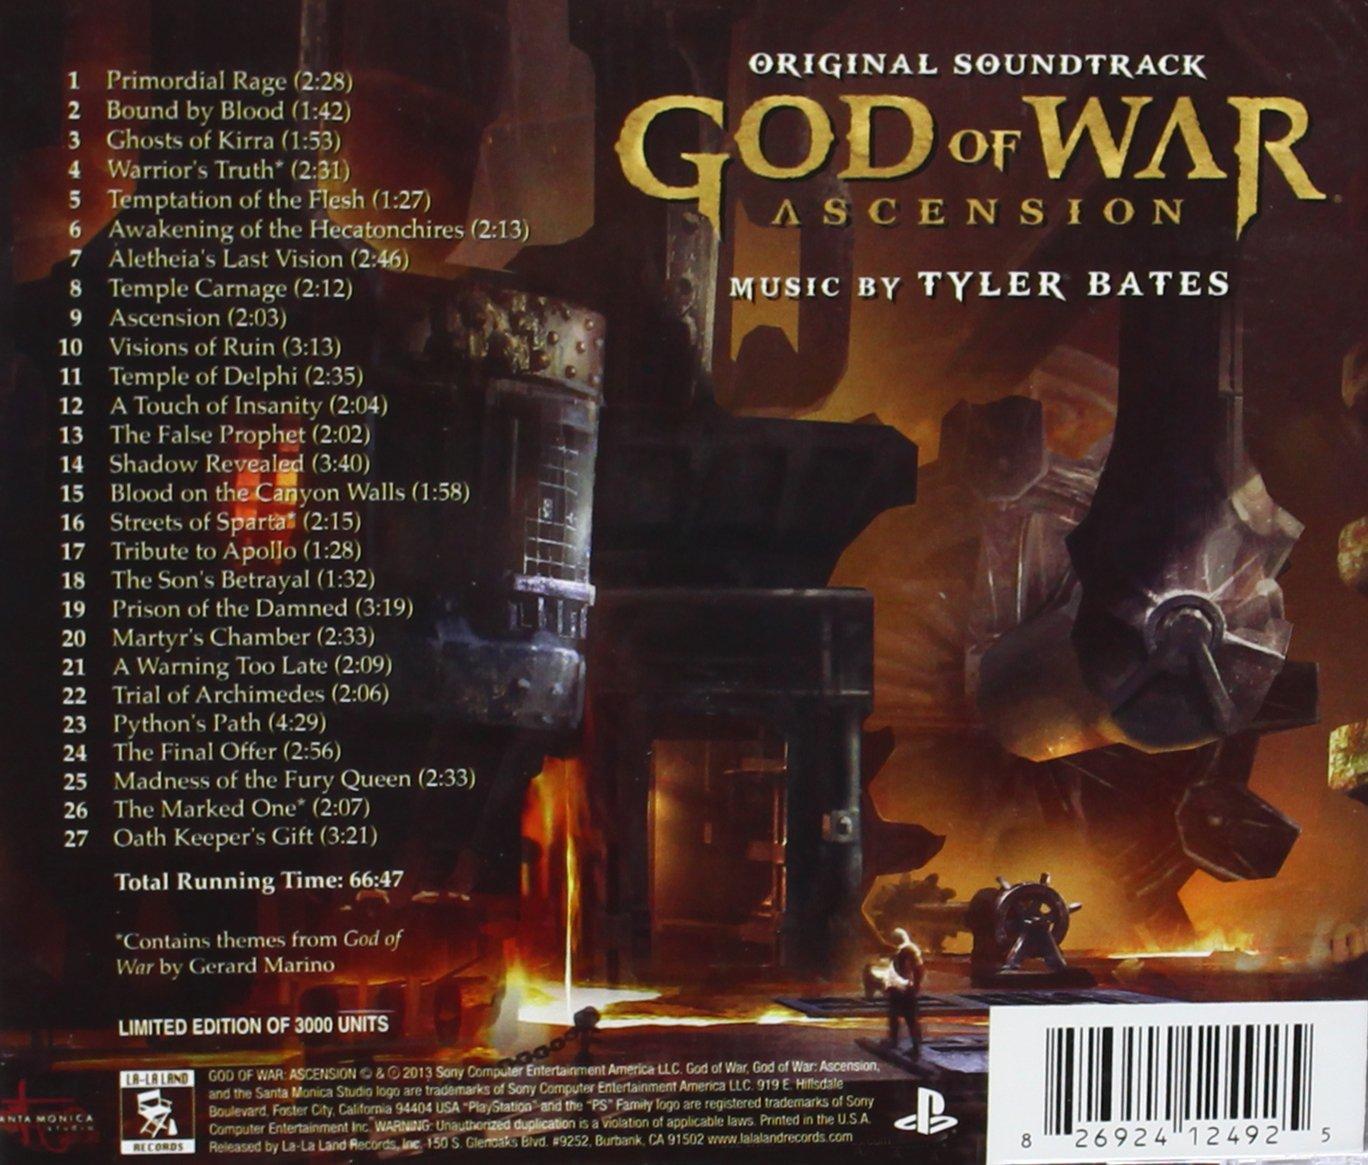 God of war accension reg code grip down load